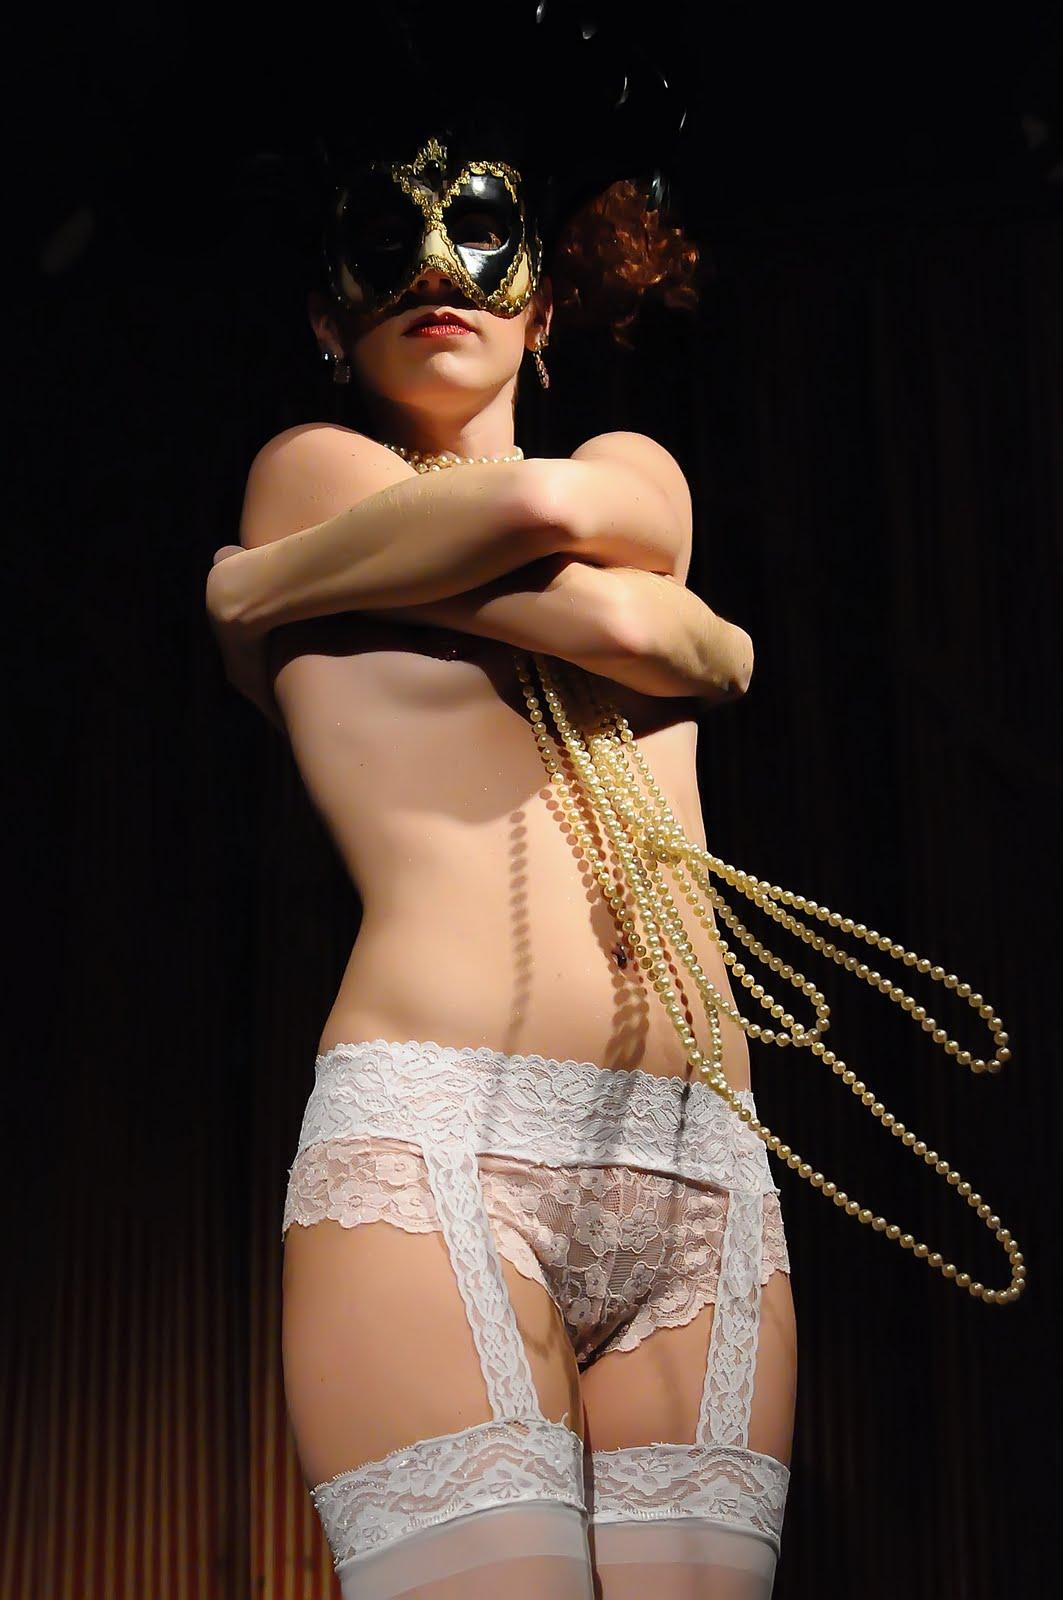 Songtext Naked Cousin von PJ Harvey